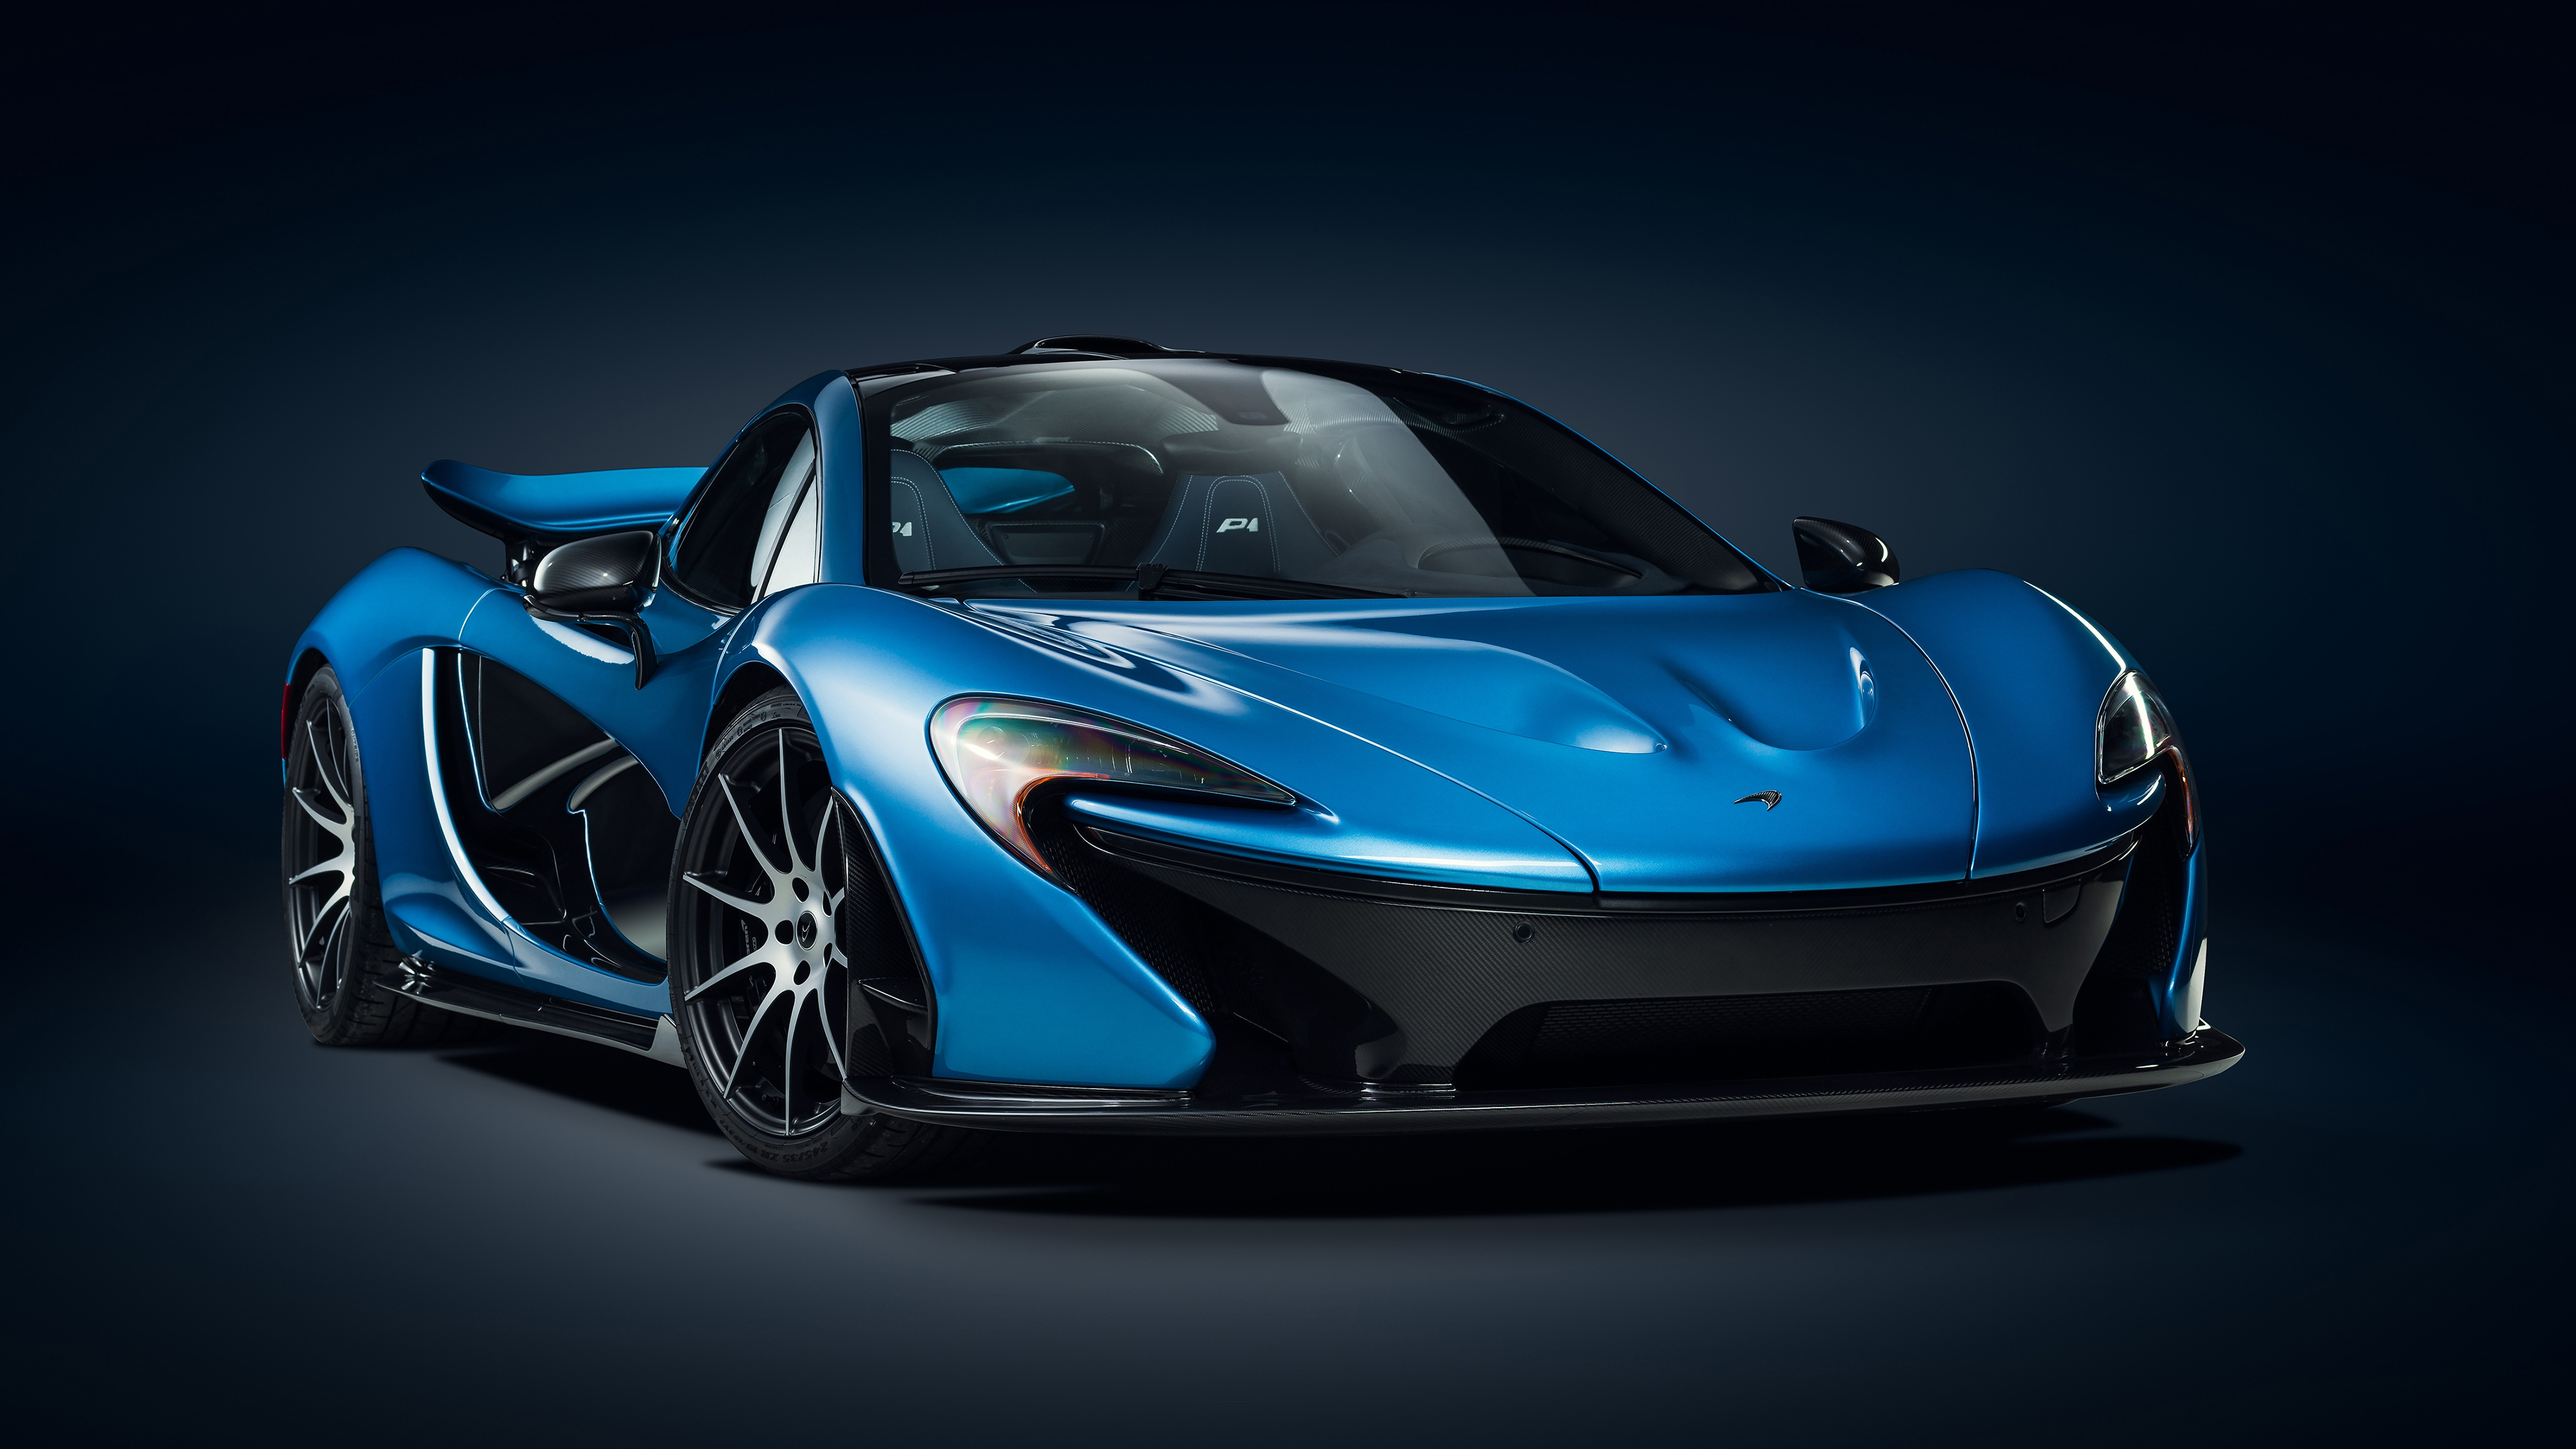 Gorgeous Blue McLaren P1 4k Ultra Fondo de pantalla HD ...